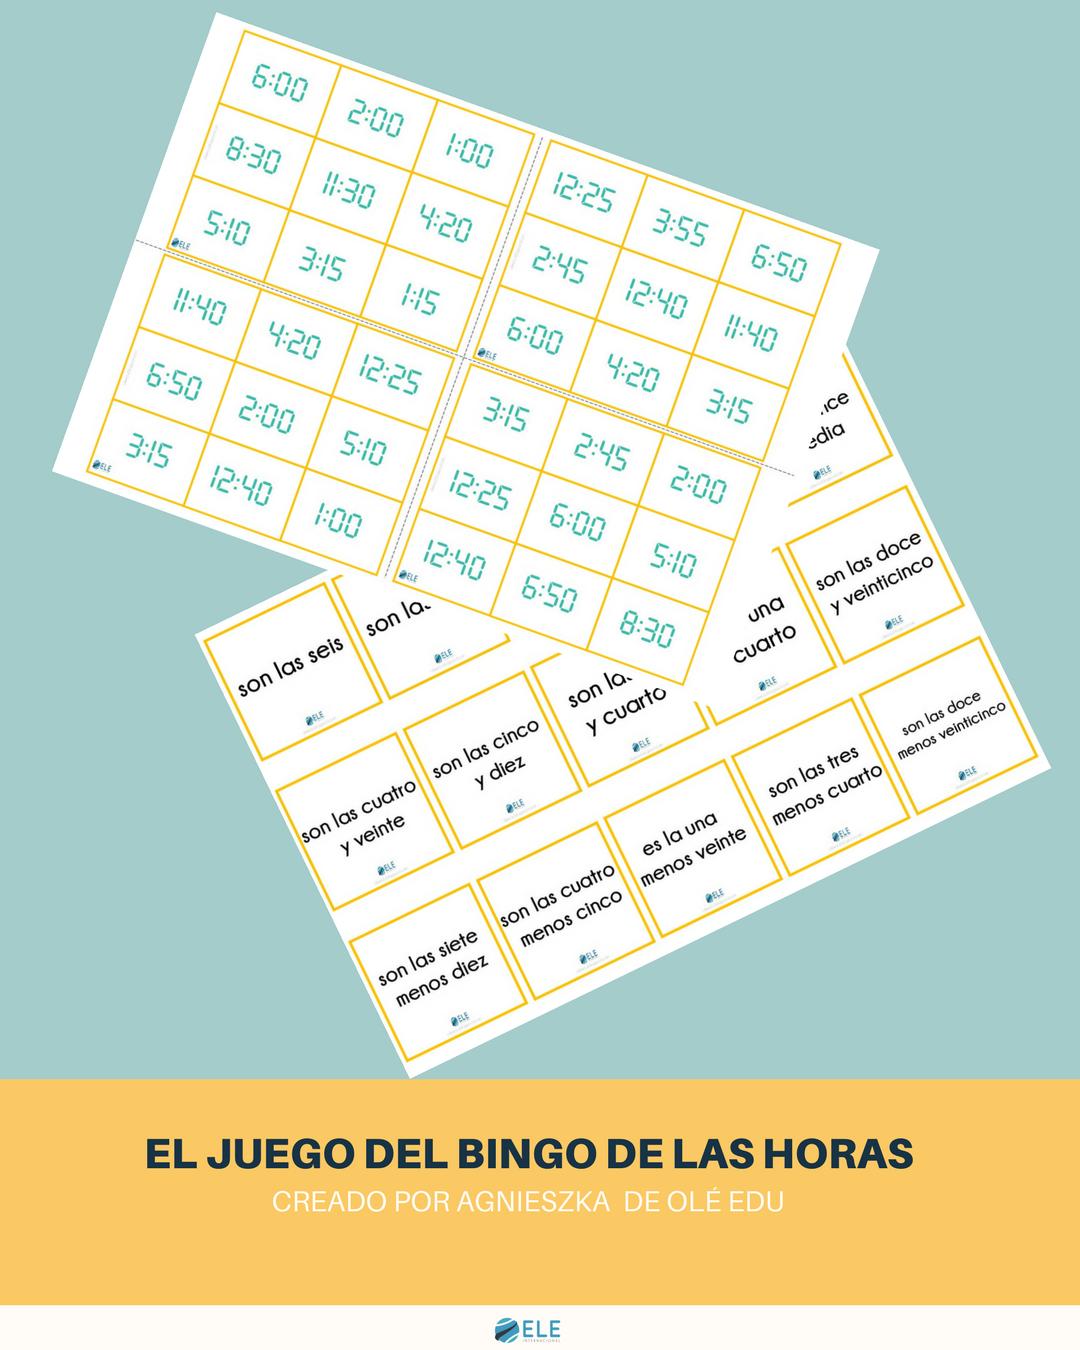 Pin By Eleinternacional On Blog Ele Internacional